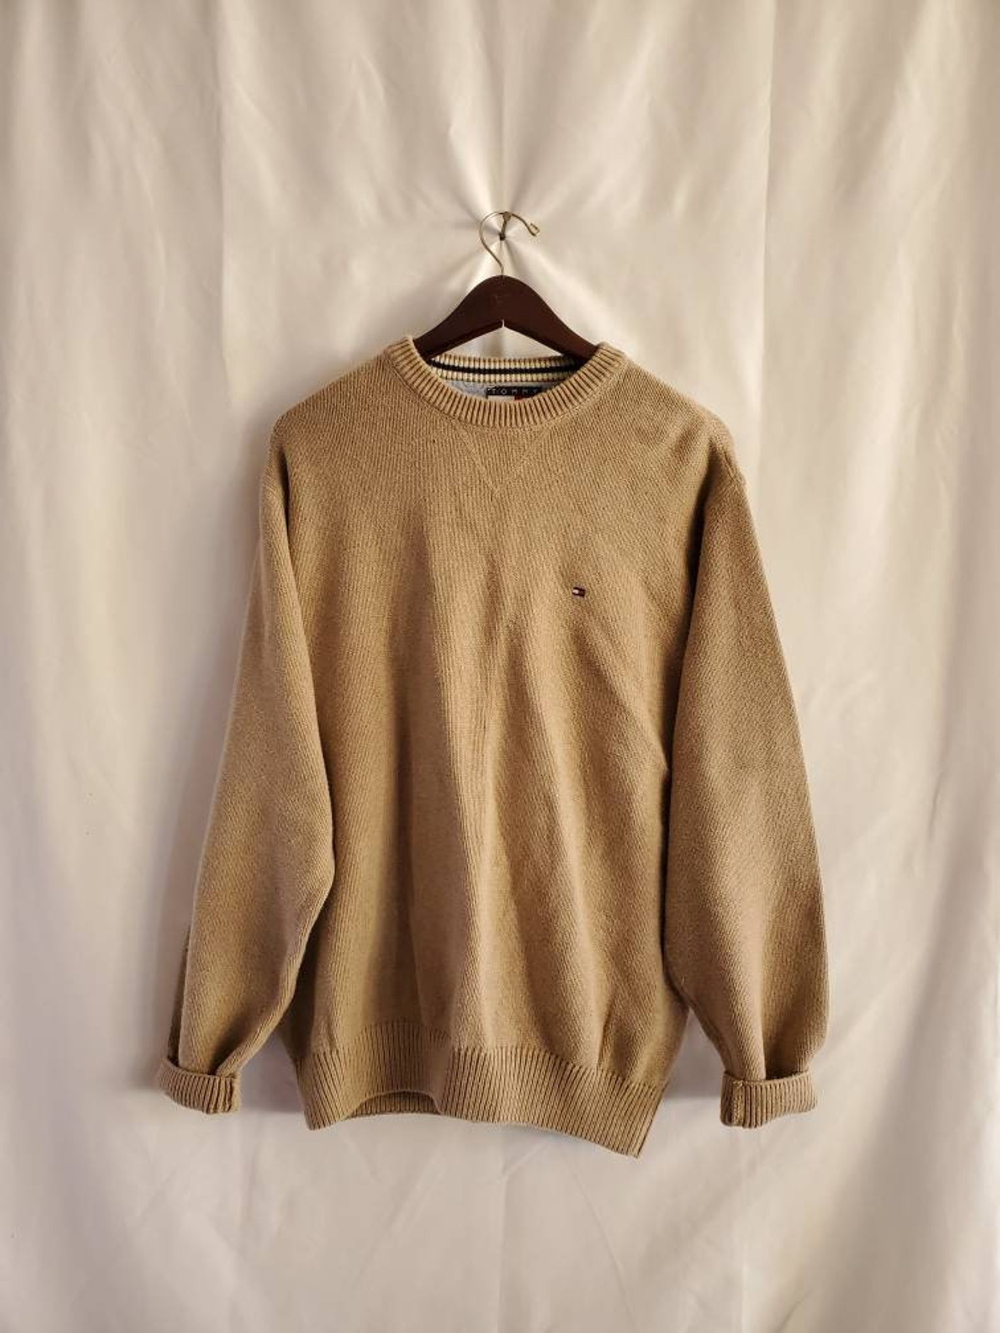 Vintage Tan Tommy Hilfiger Solid Sweater Crewneck Plain Beige Etsy Solid Sweaters Sweaters Beige Crewneck [ 1333 x 1000 Pixel ]